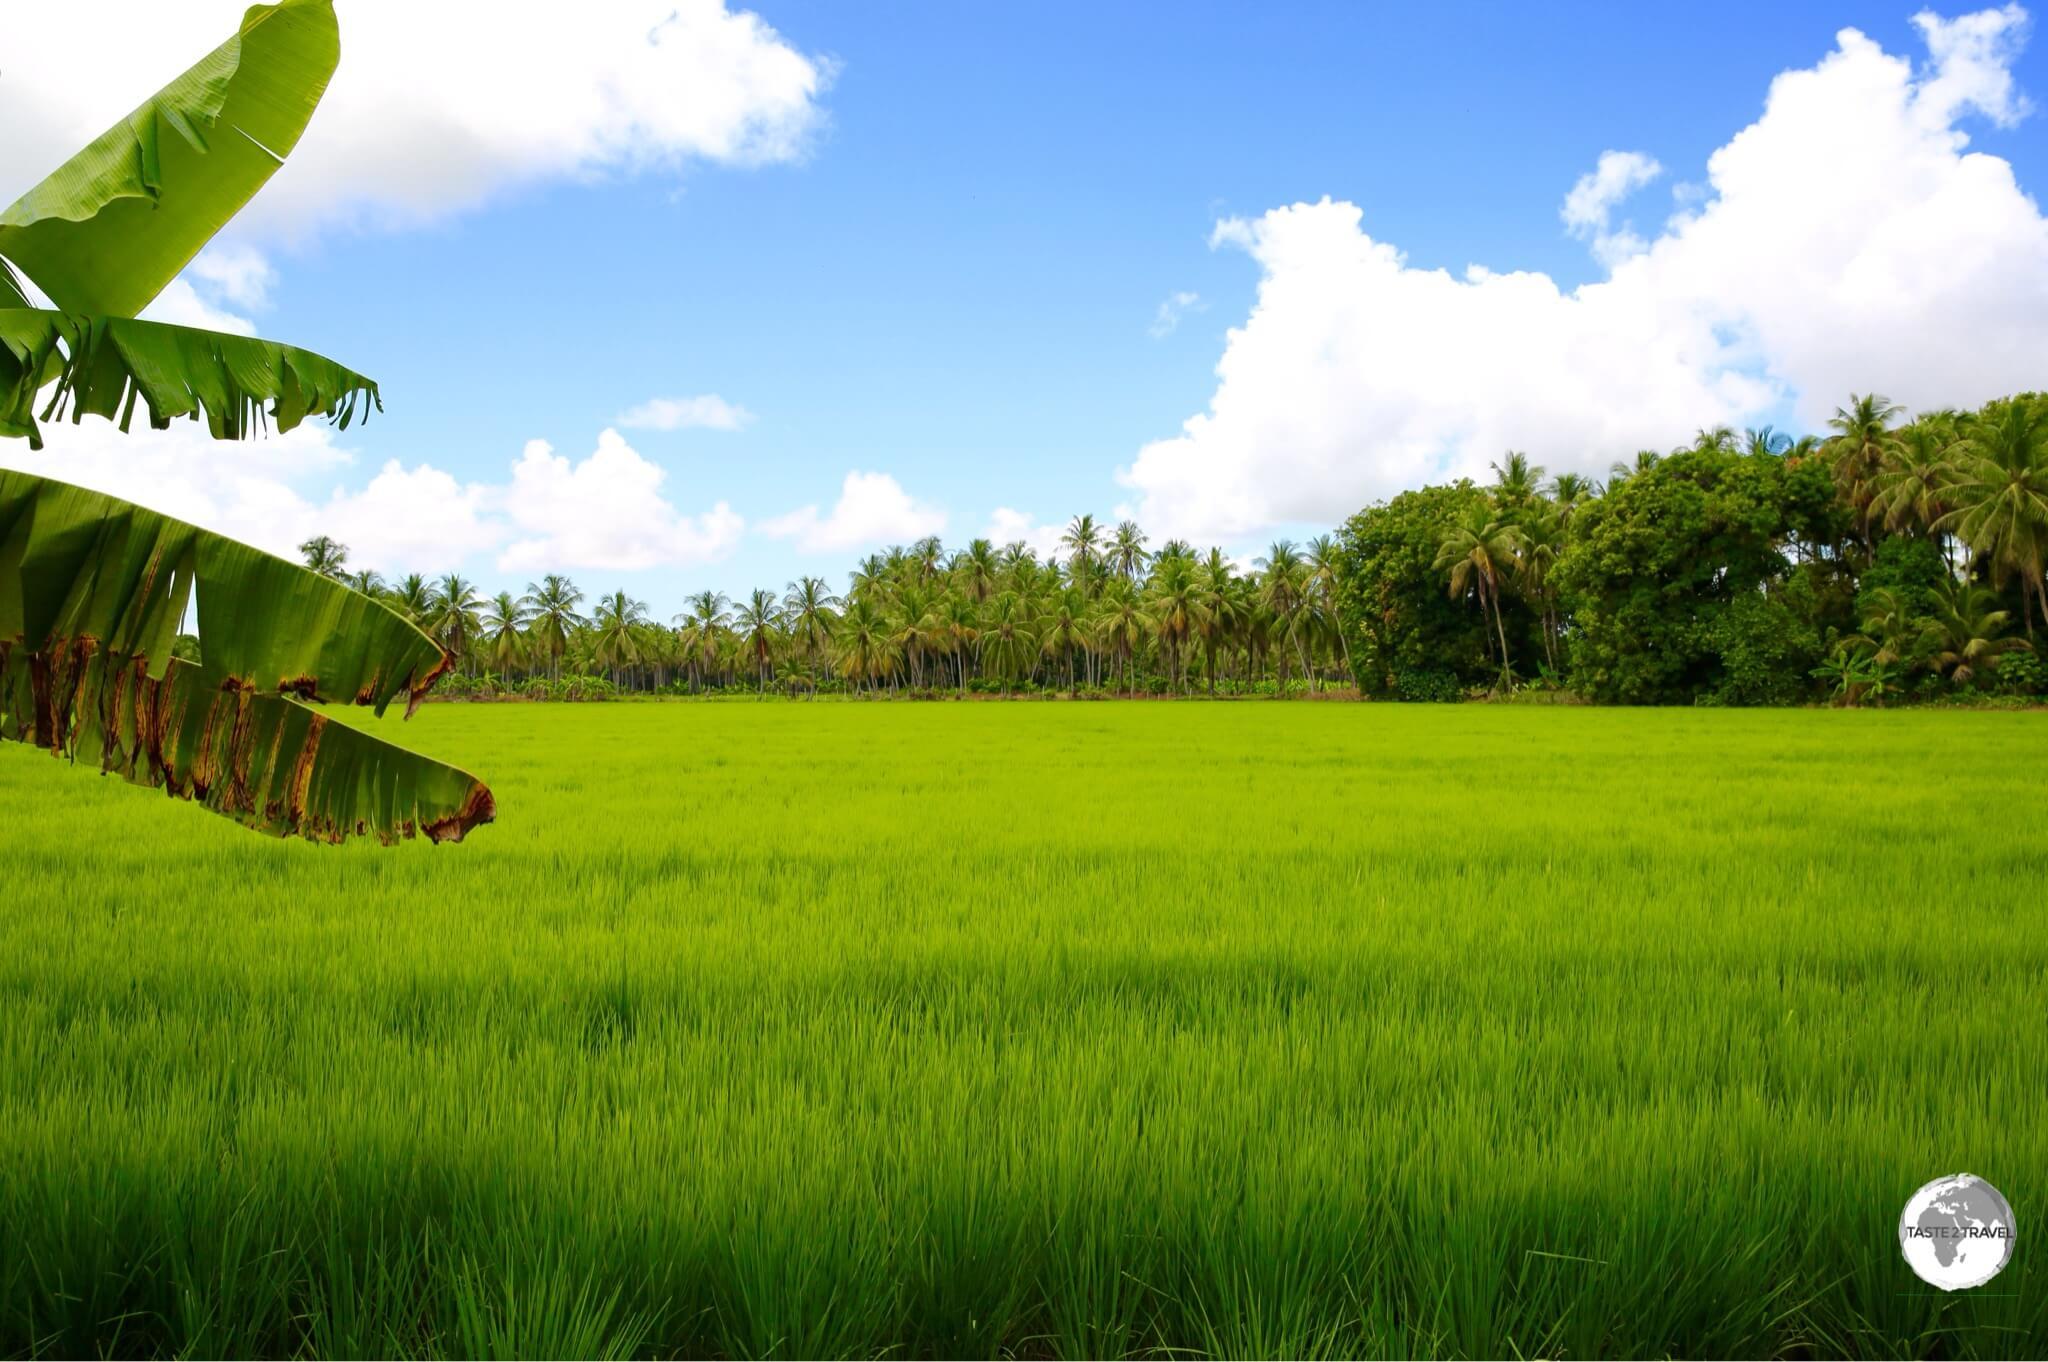 Rice farming is the main occupation on Wakenaam Island.